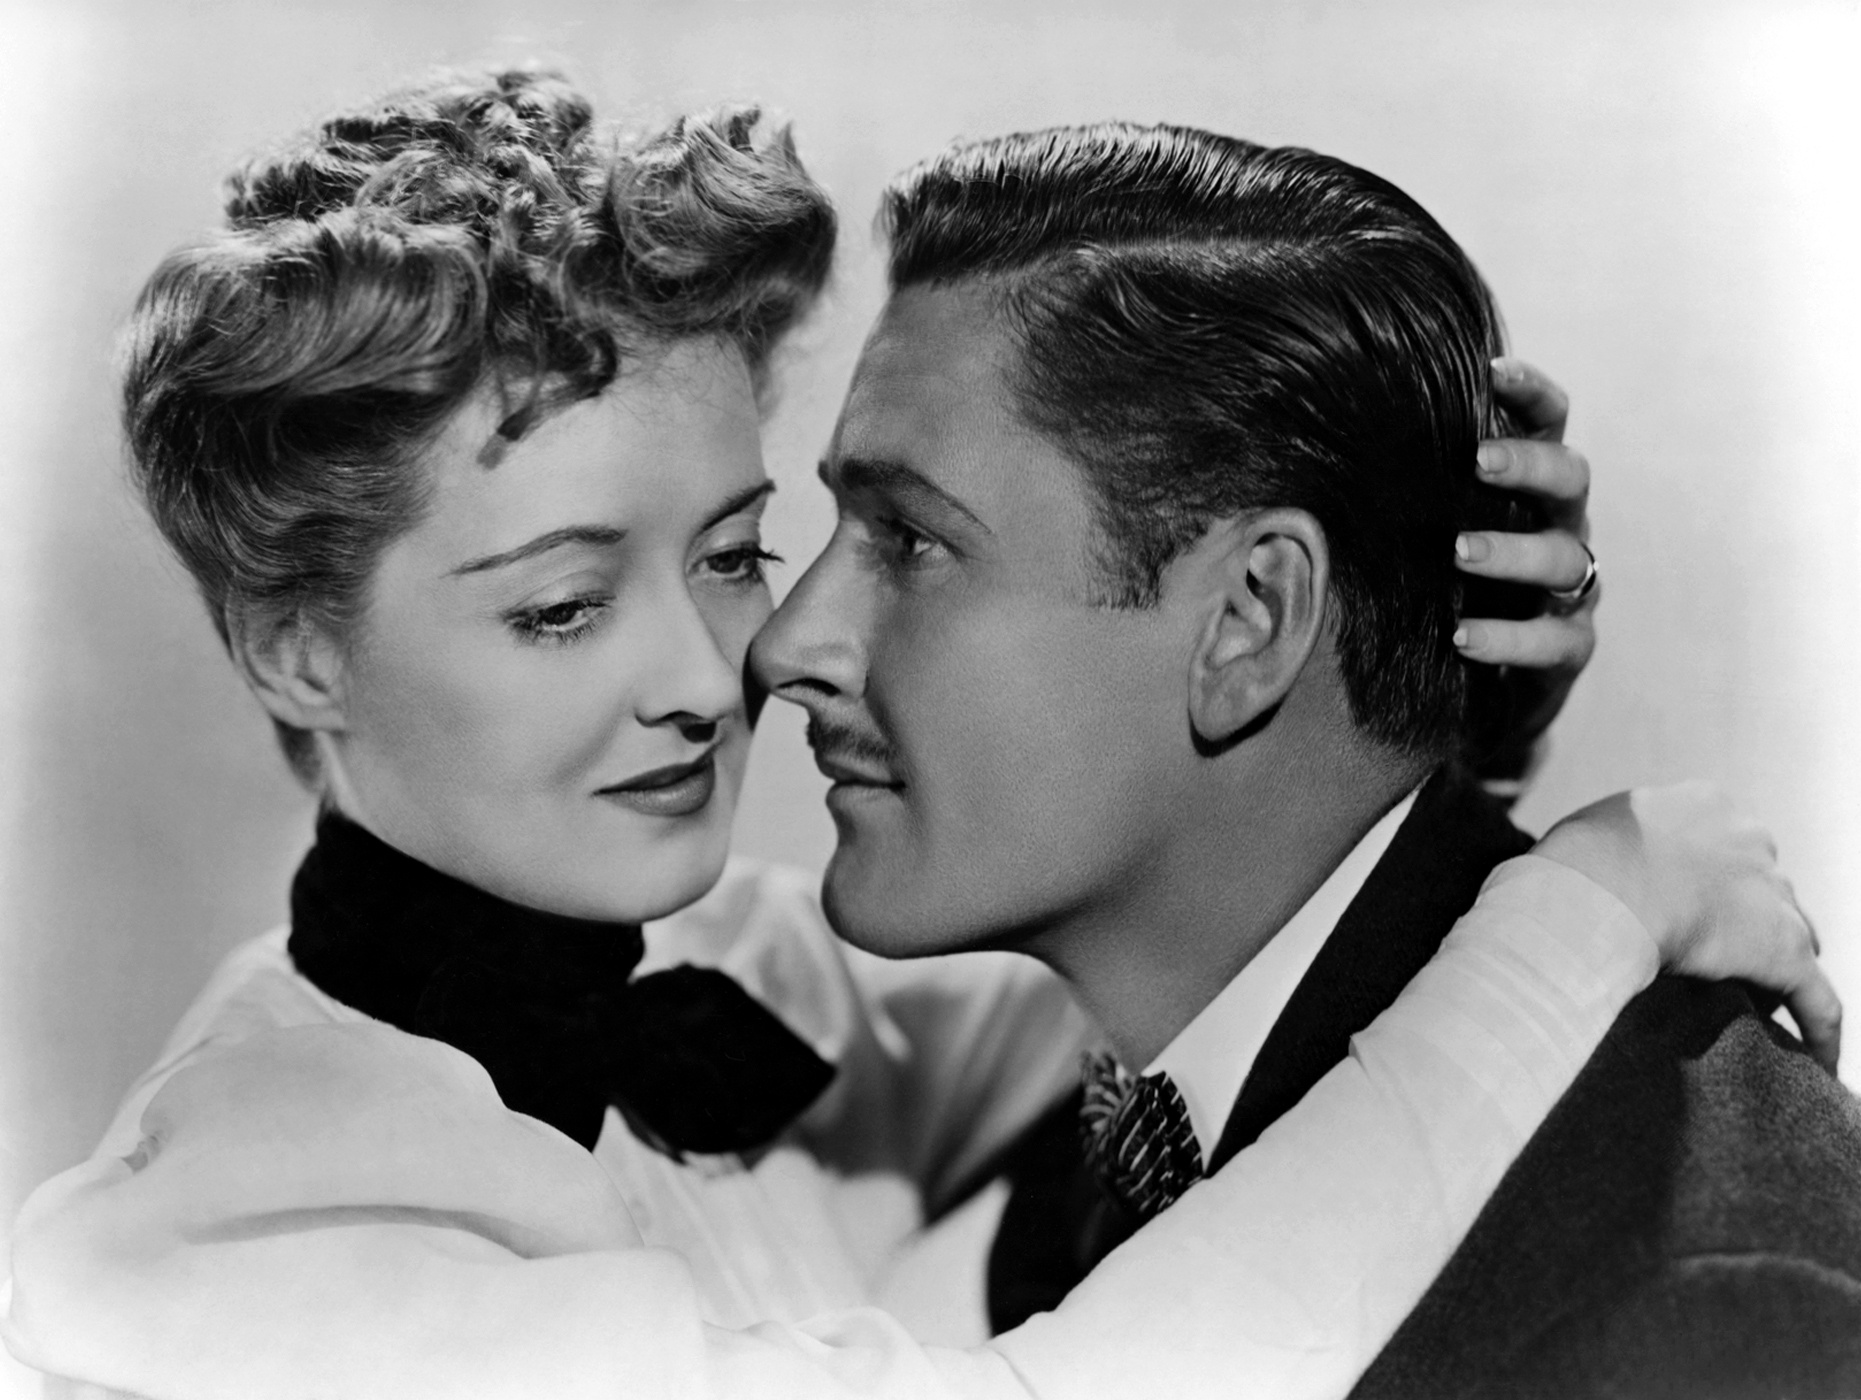 Davis and Bette